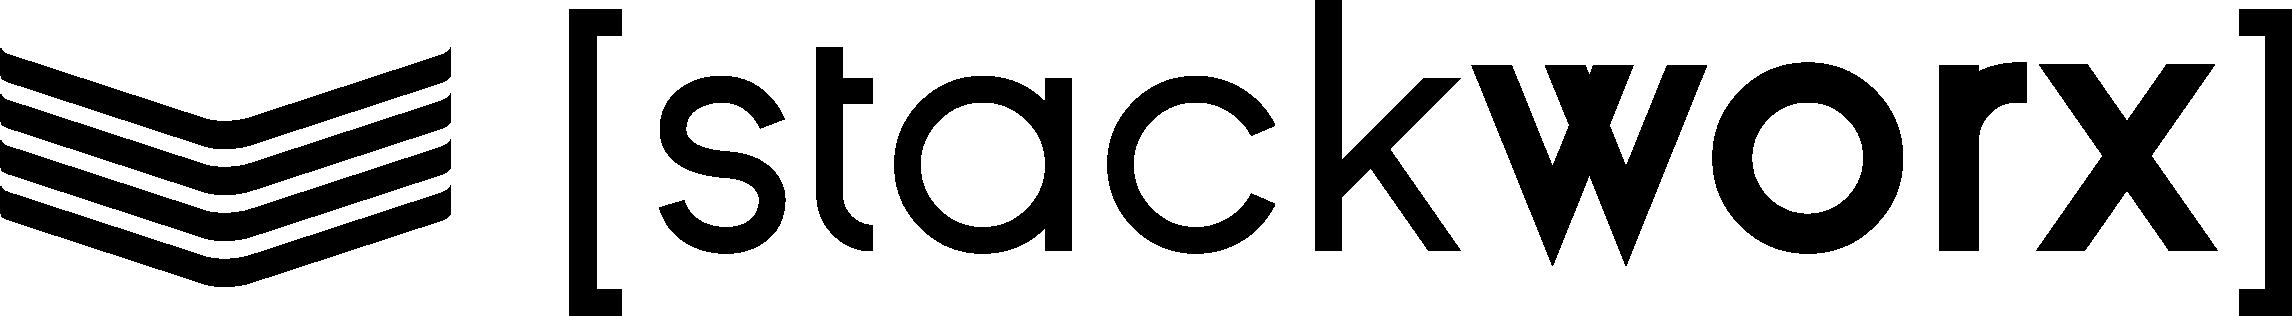 Stackworx.co Logo